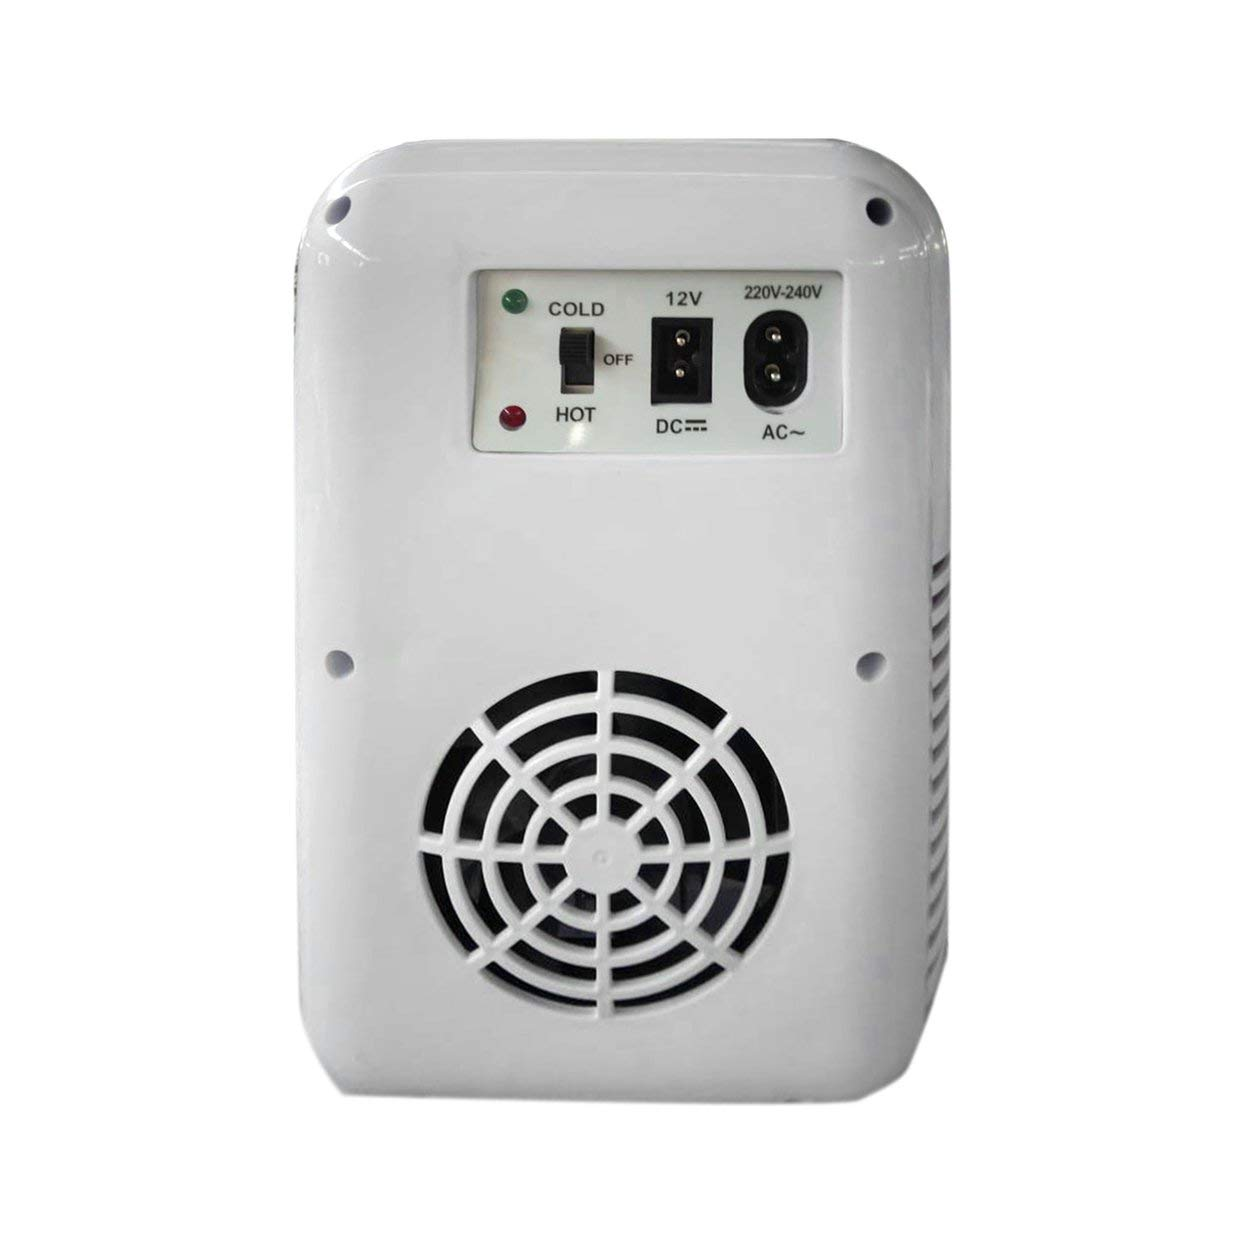 anyilon Dual-Use 4L Home Car Use Refrigerators Ultra Quiet Low Noise Car Mini Refrigerators Freezer Cooling Heating Box Fridge by anyilon (Image #6)